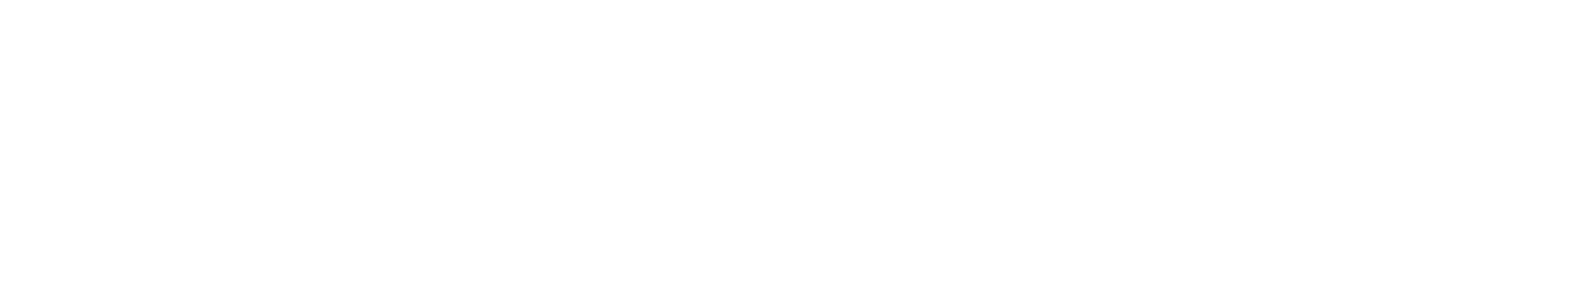 International Footbal Academy Soccer Interaction in Spain/ ACADEMIA INTERNACIONAL DE FUTBOL EN VALENCIA